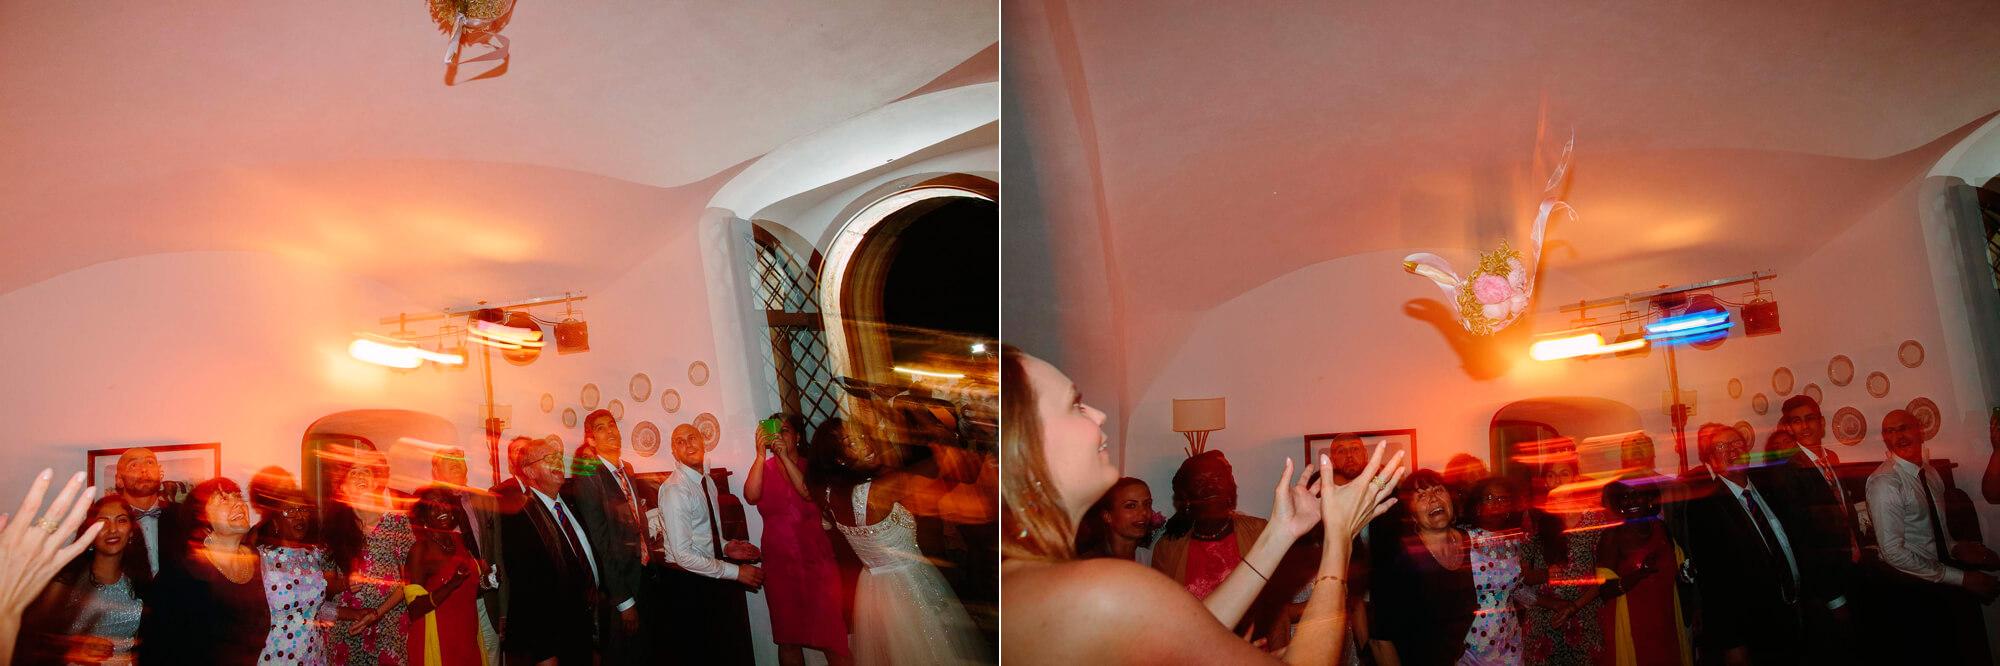 174-sorrento-wedding-photographer.jpg